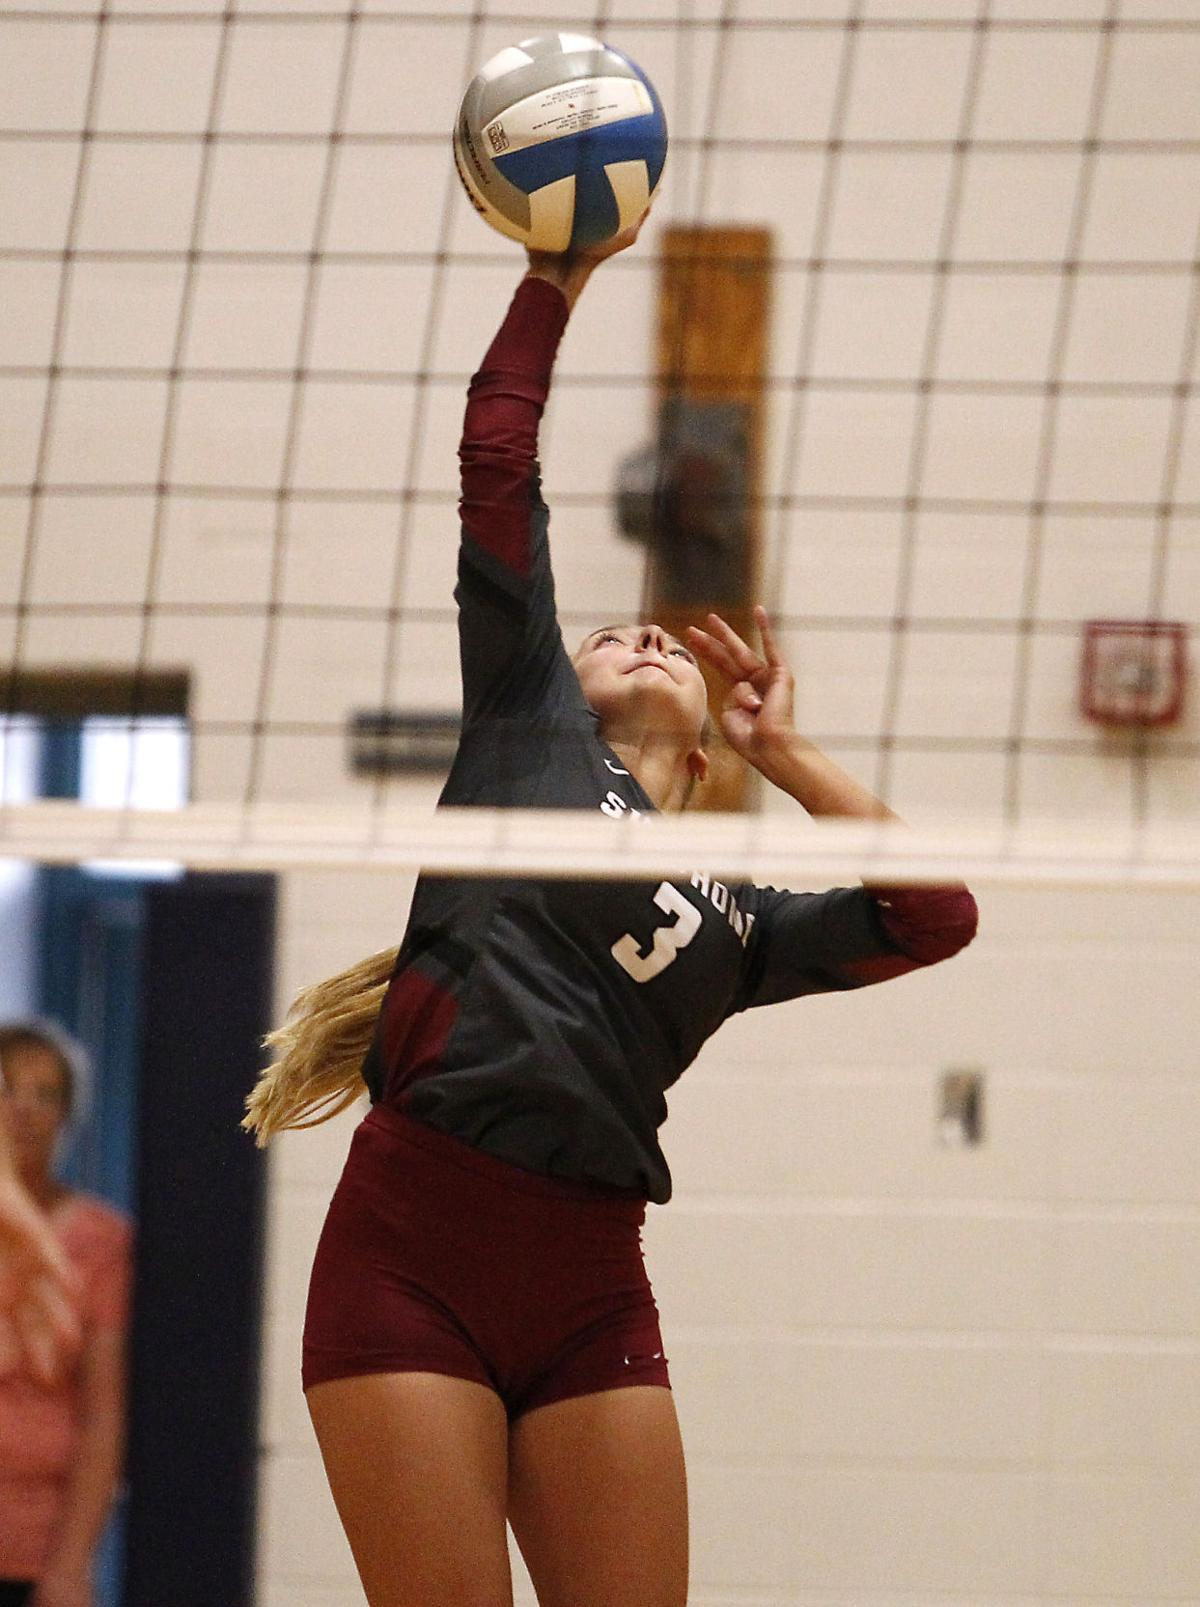 Volleyball - Shoshone Vs. Wendell